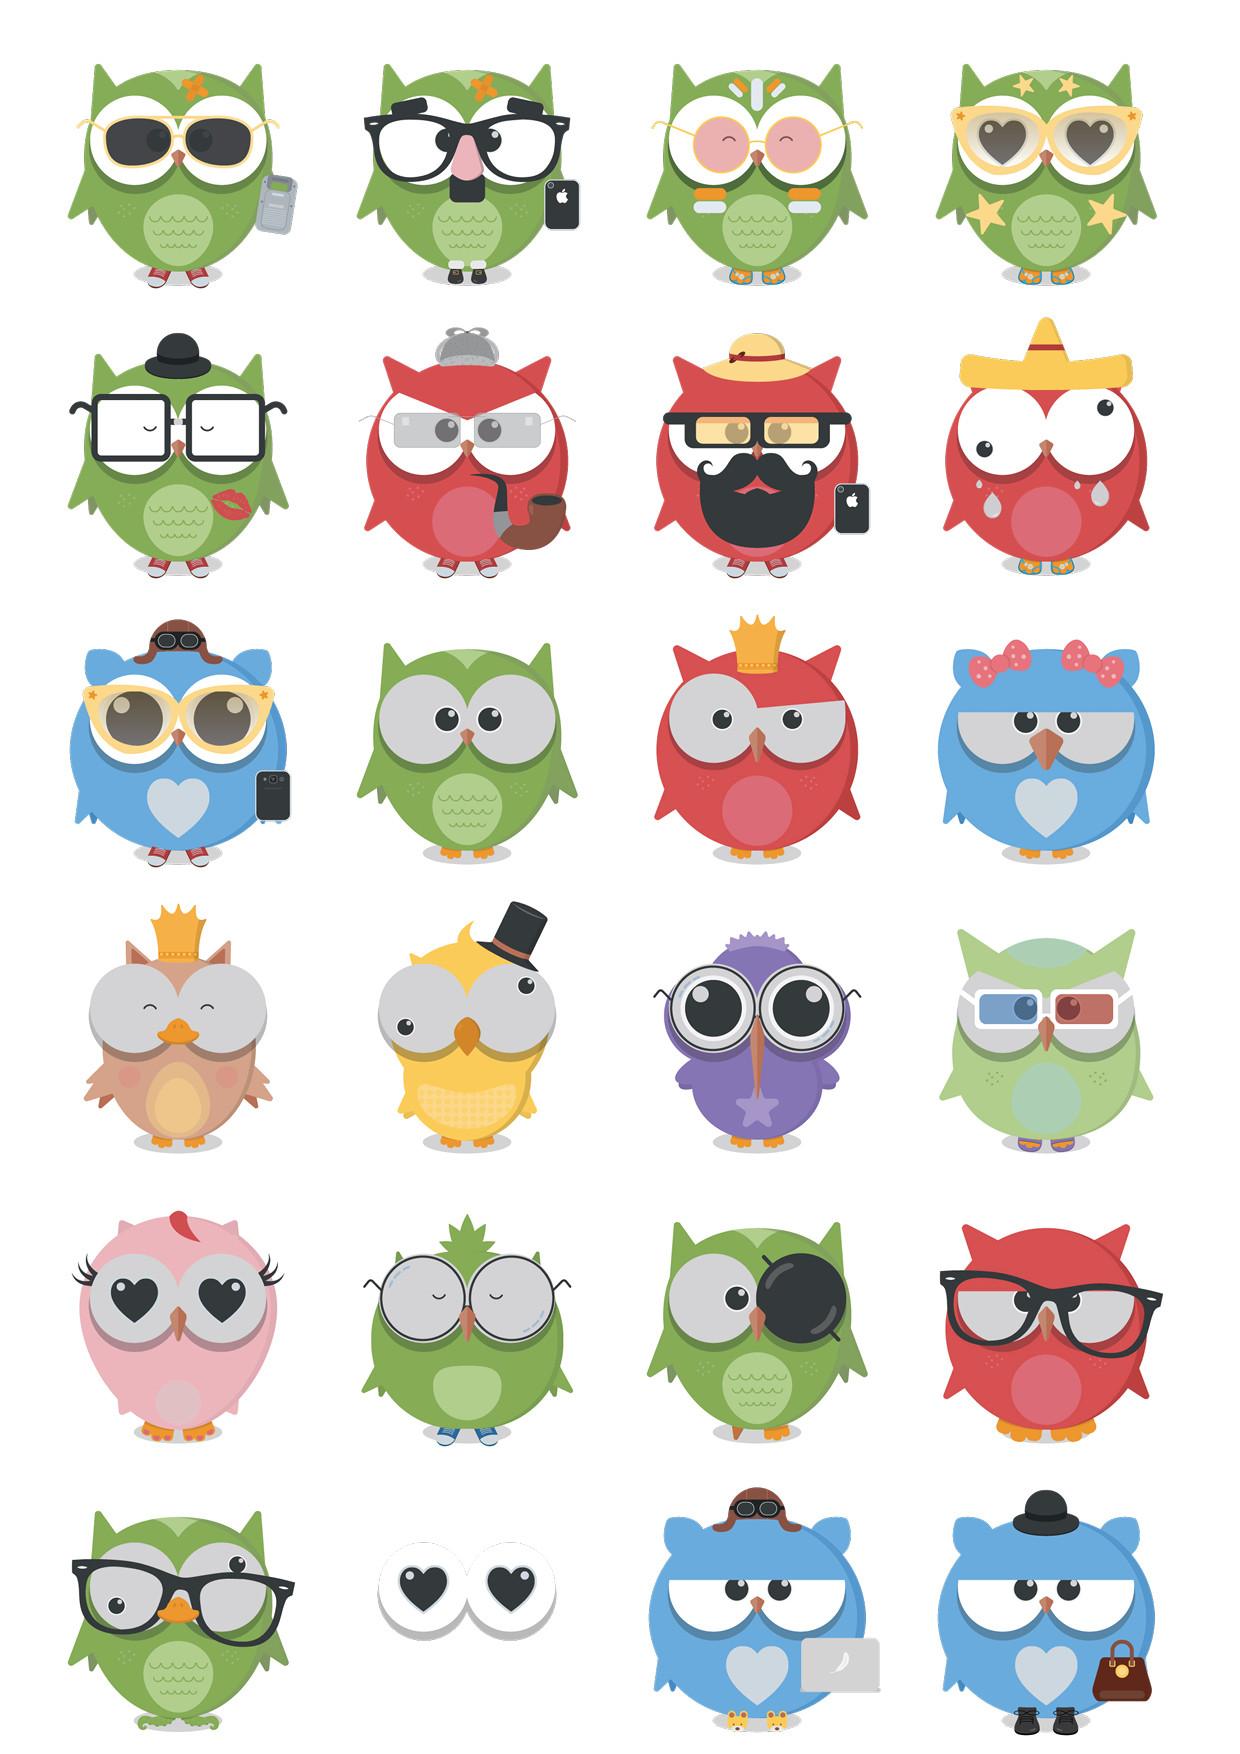 Marco baccioli owls 2